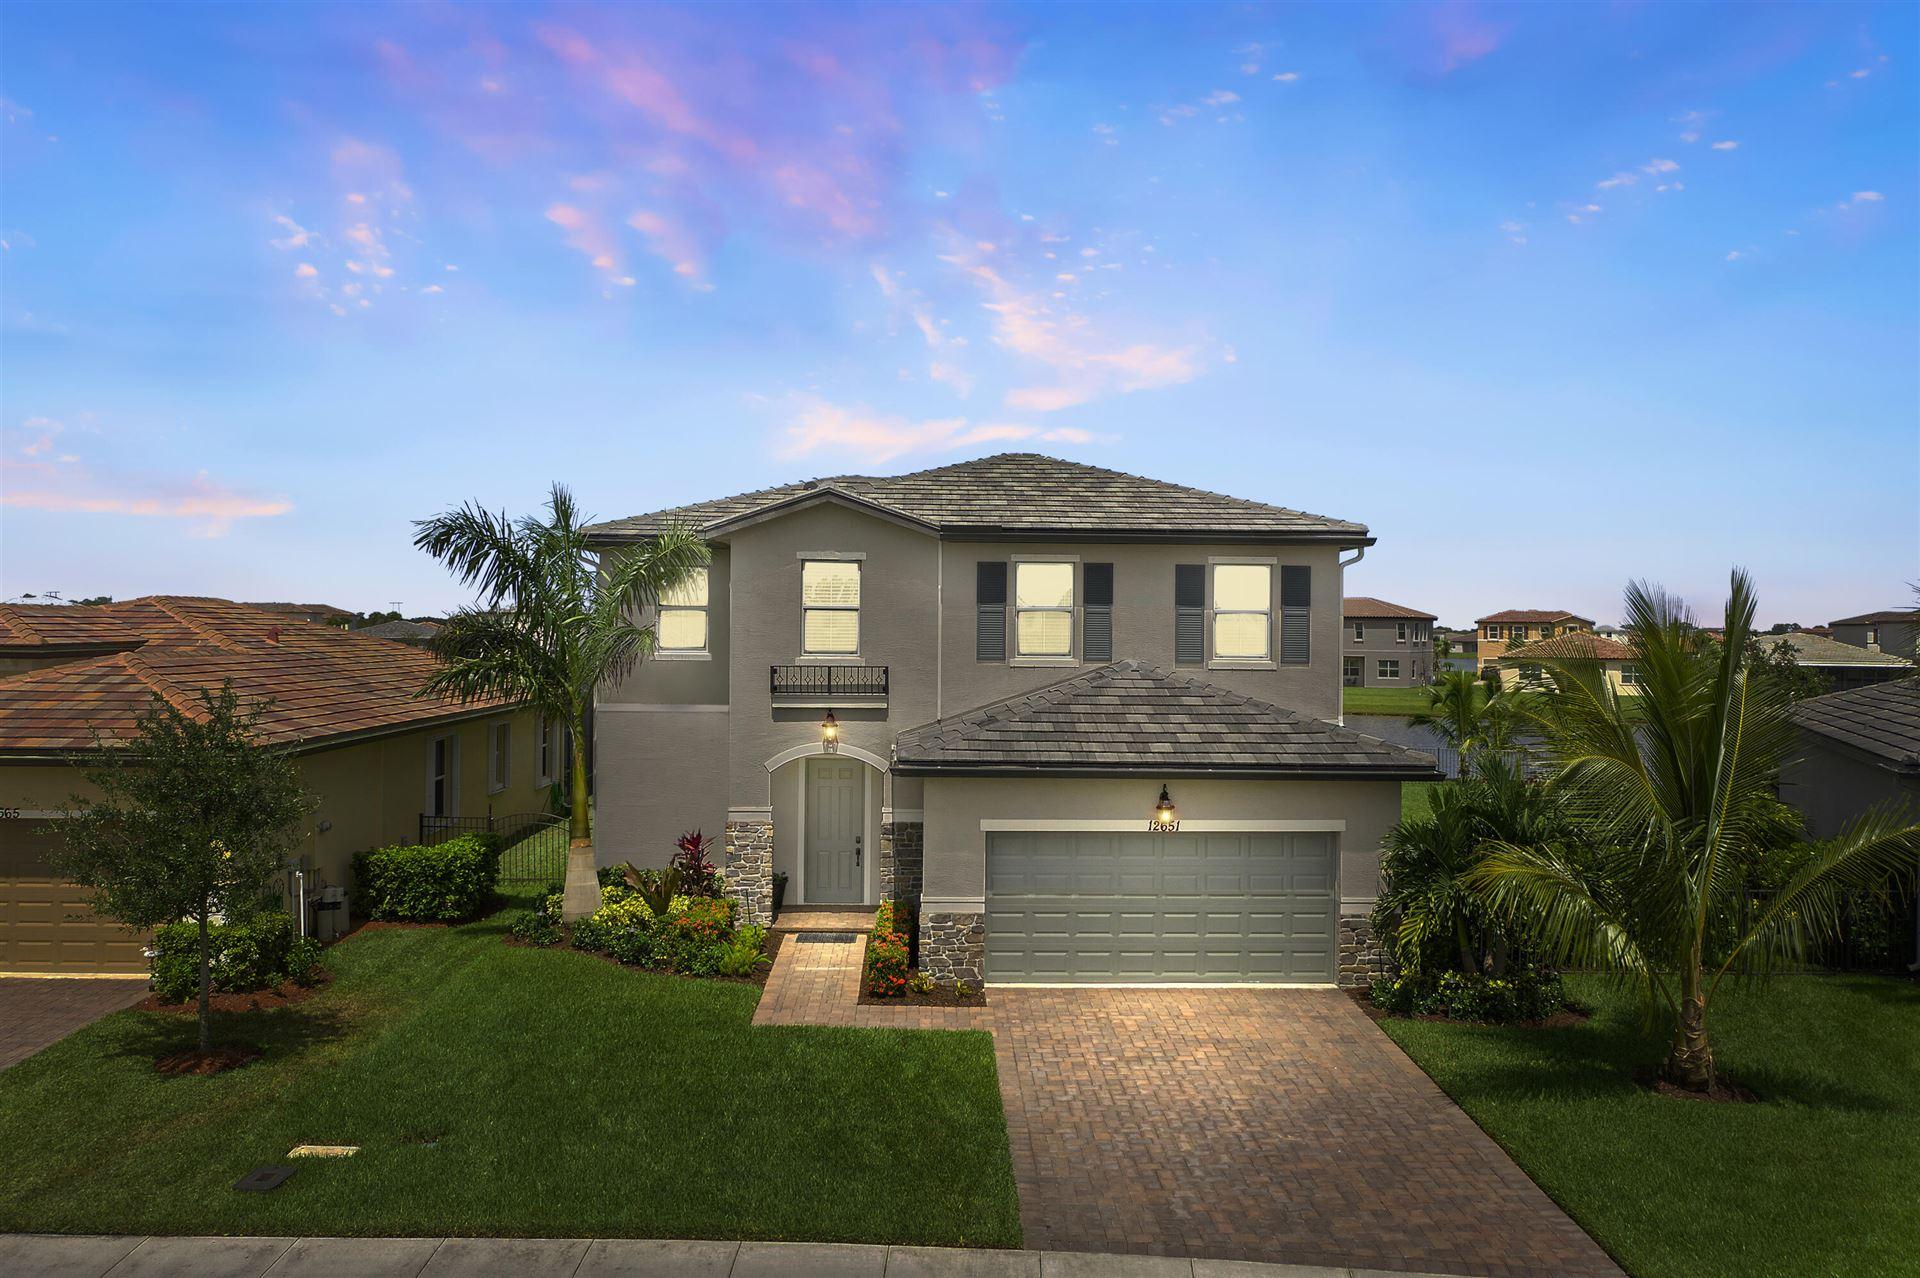 12651 NW Milestone Place, Port Saint Lucie, FL 34987 - MLS#: RX-10742918